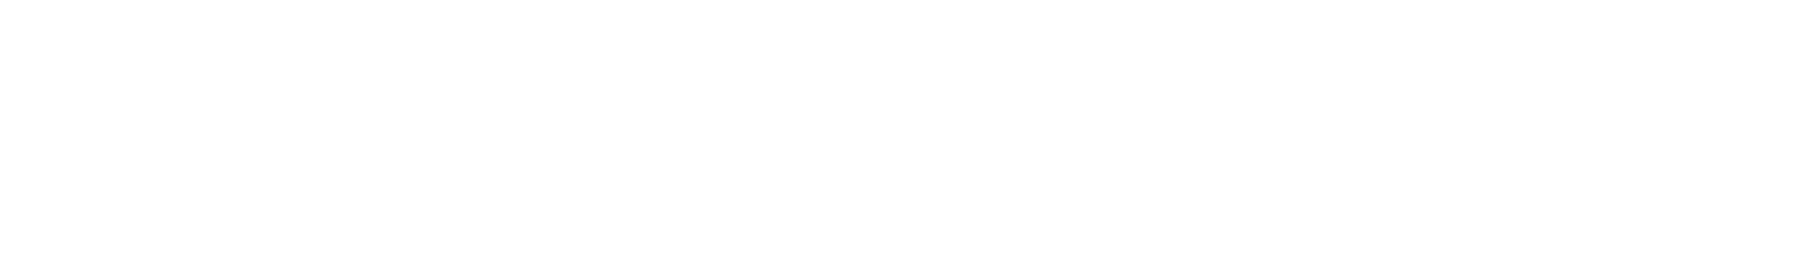 perc 1